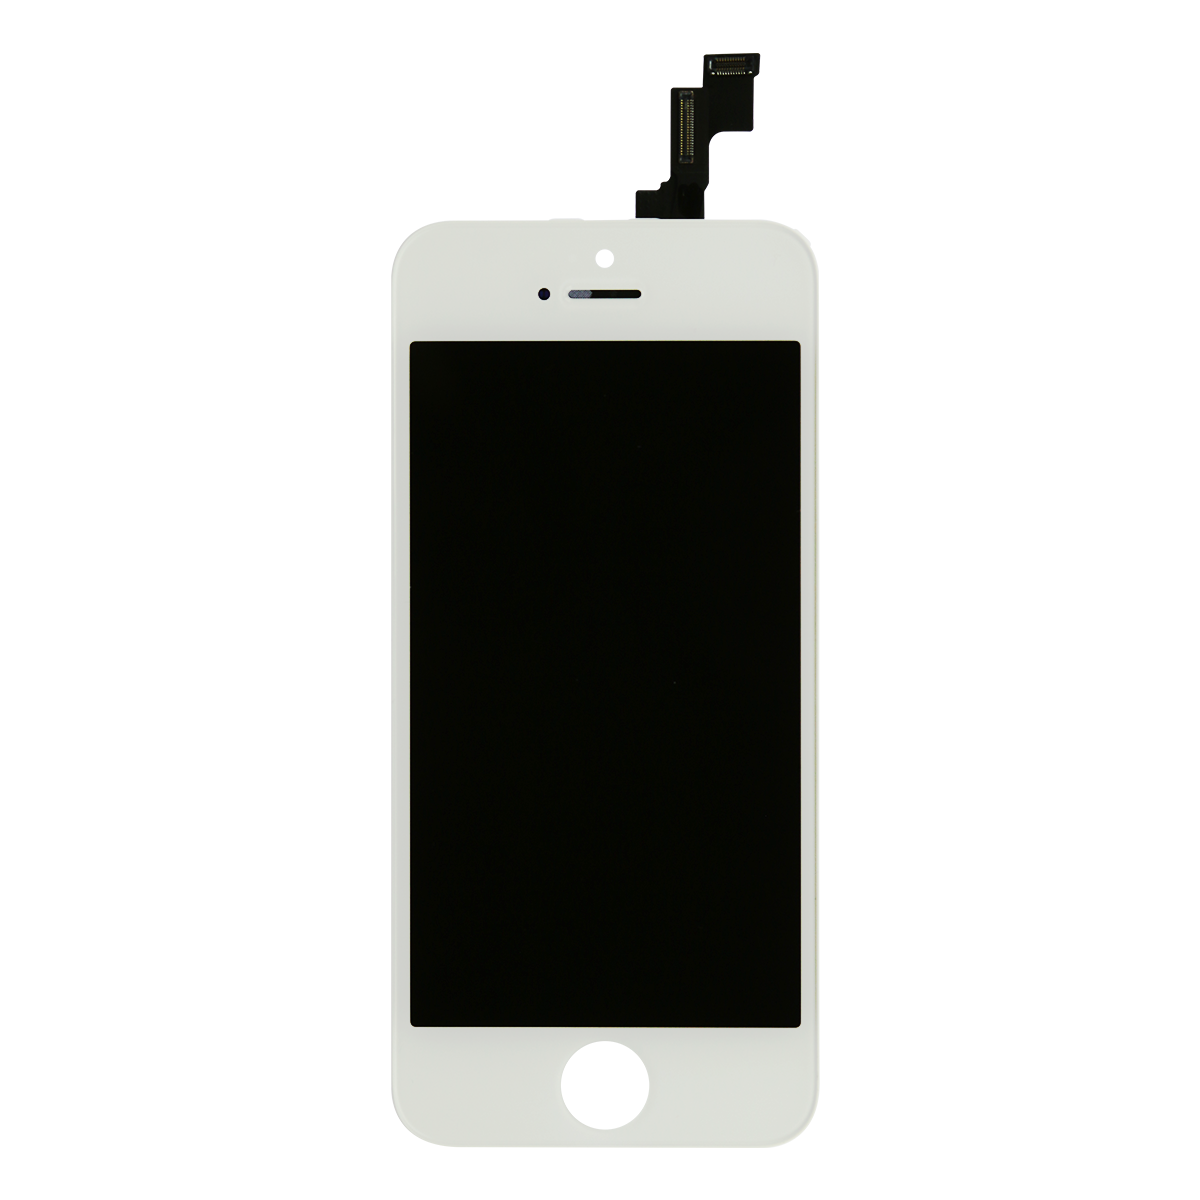 Display LCD Assemblato Grado AAA+ OEM iPhone 5SE Bianco